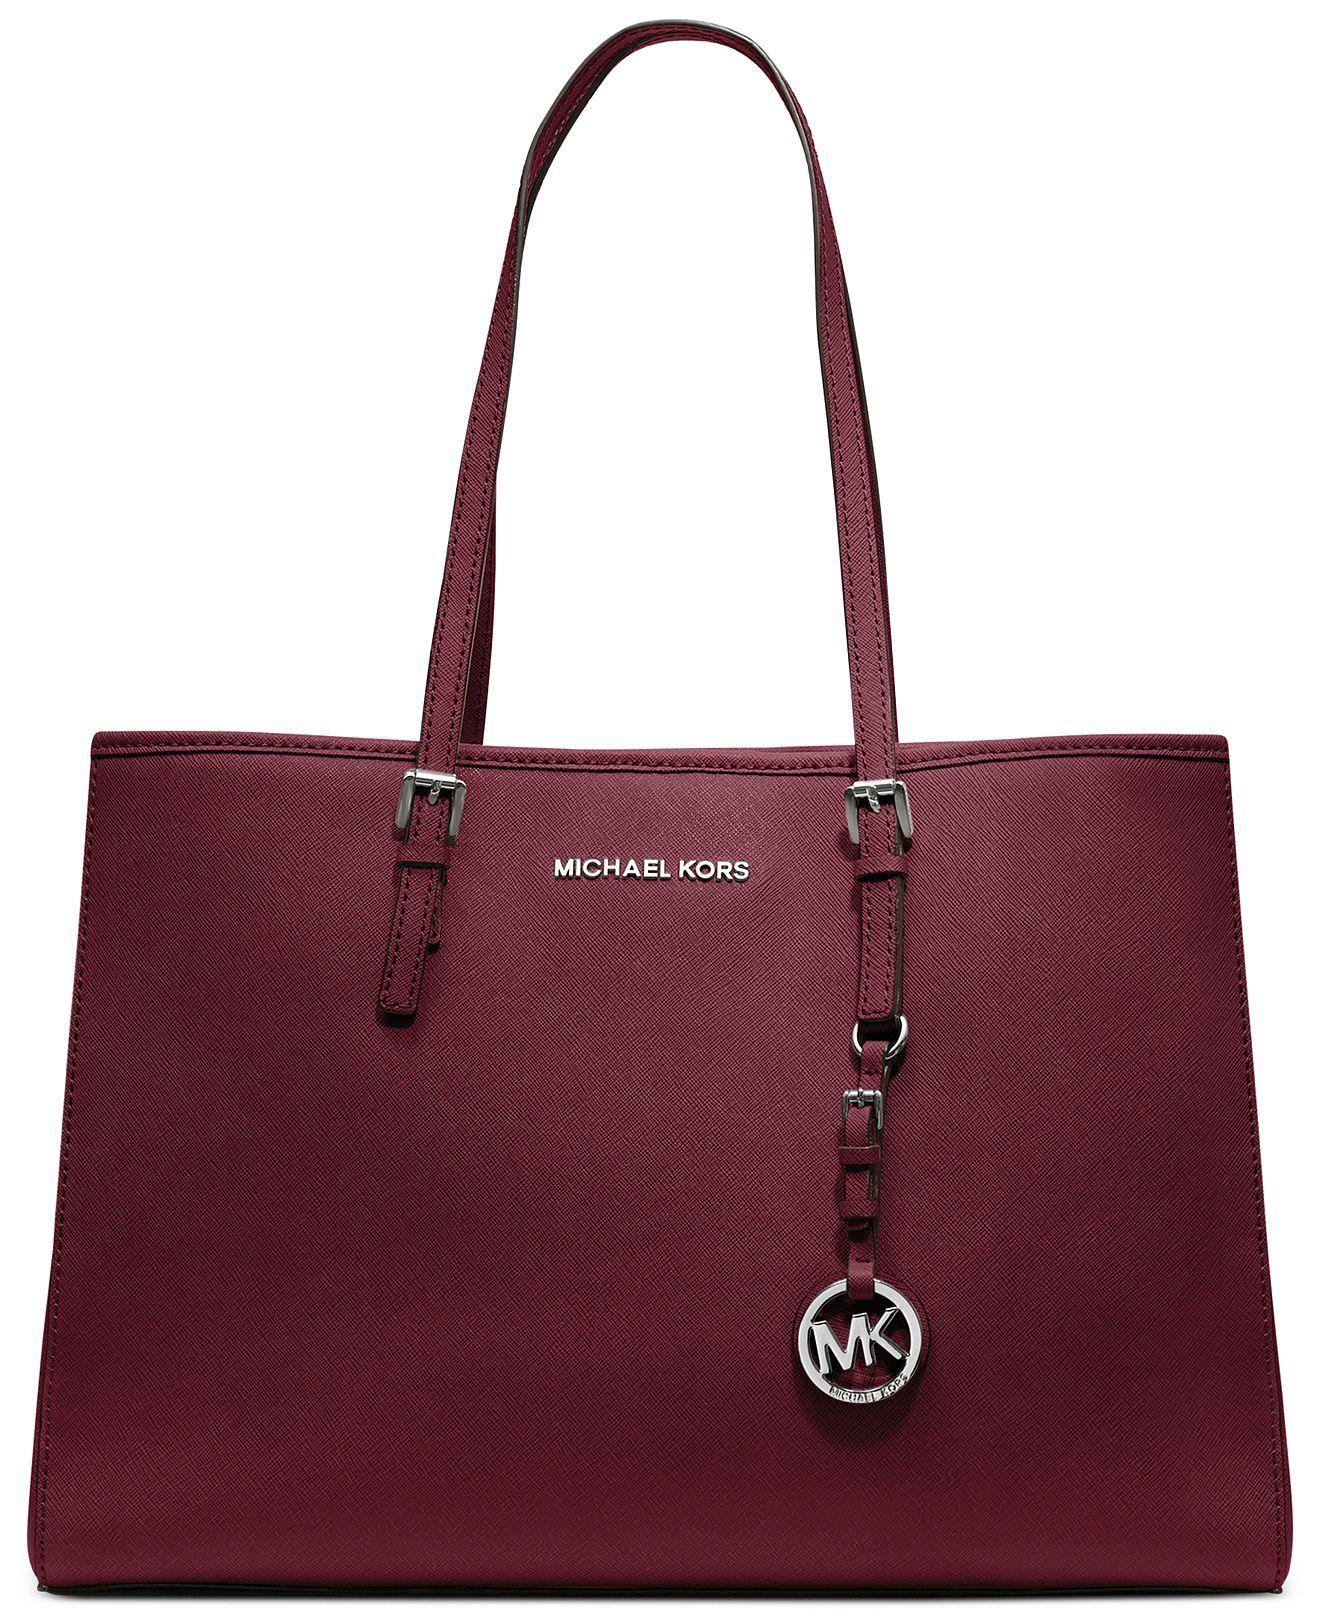 4a5978bfd224 Great work bag! MICHAEL Michael Kors Handbag, Jet Set Travel East West Tote  - MICHAEL Michael Kors - Handbags & Accessories - Macy's